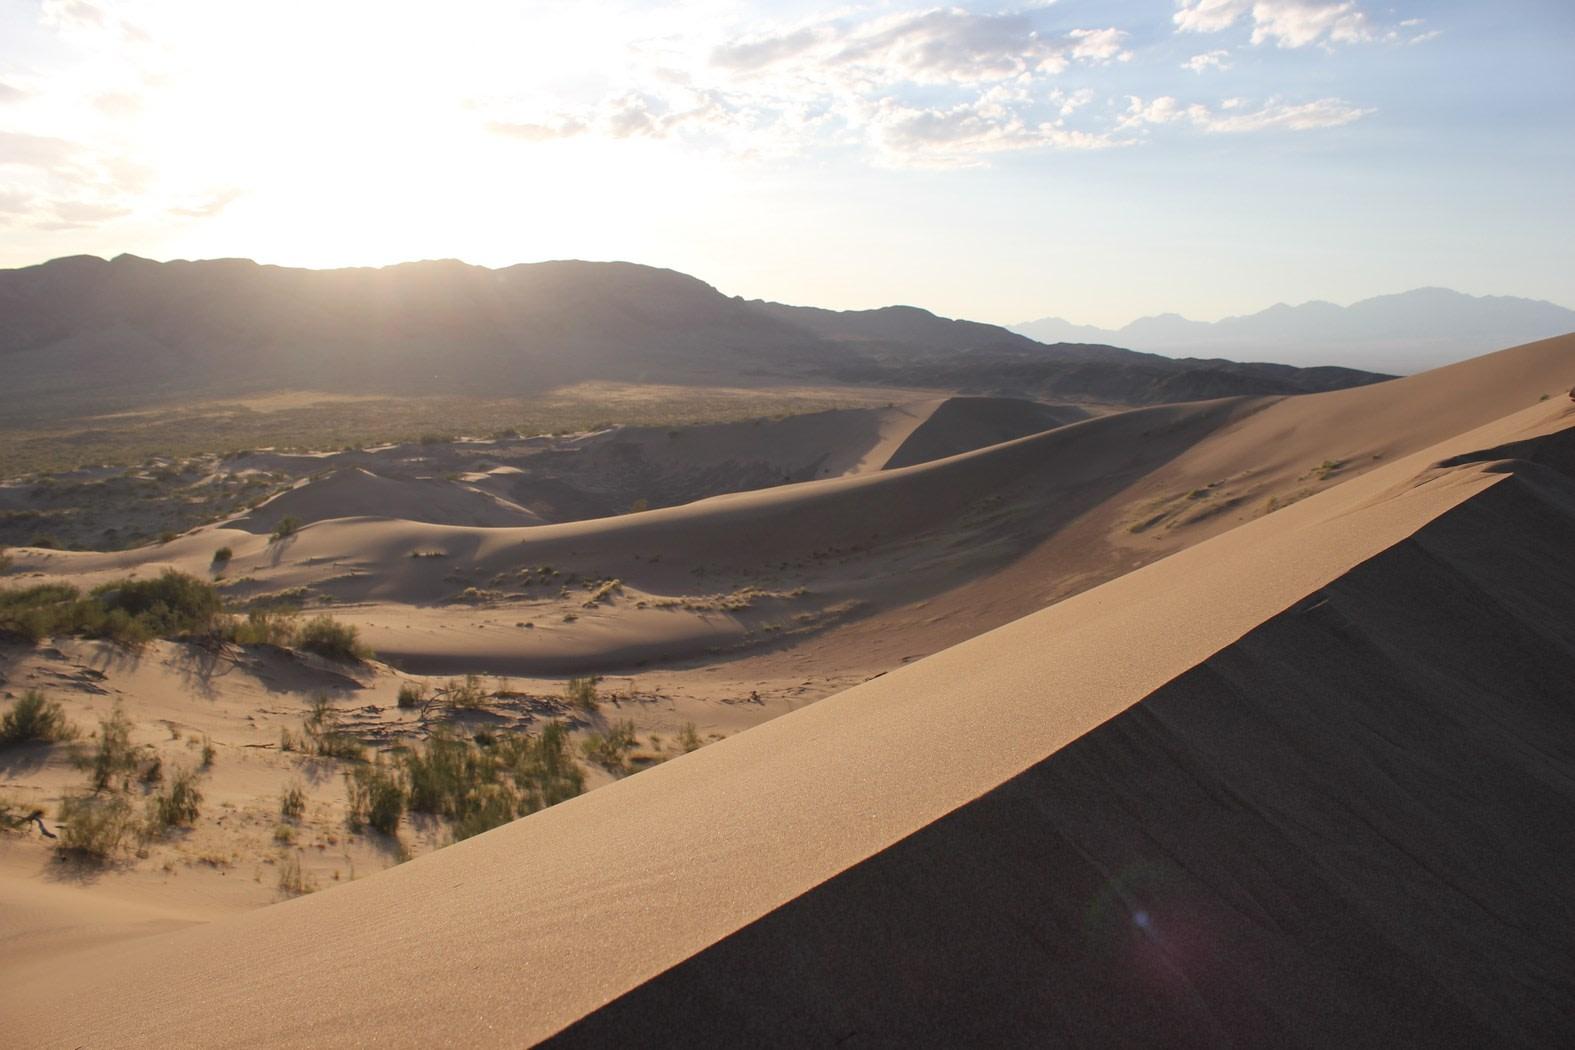 Sand Dunes in Altyn Emel National Park, Kazakhstan